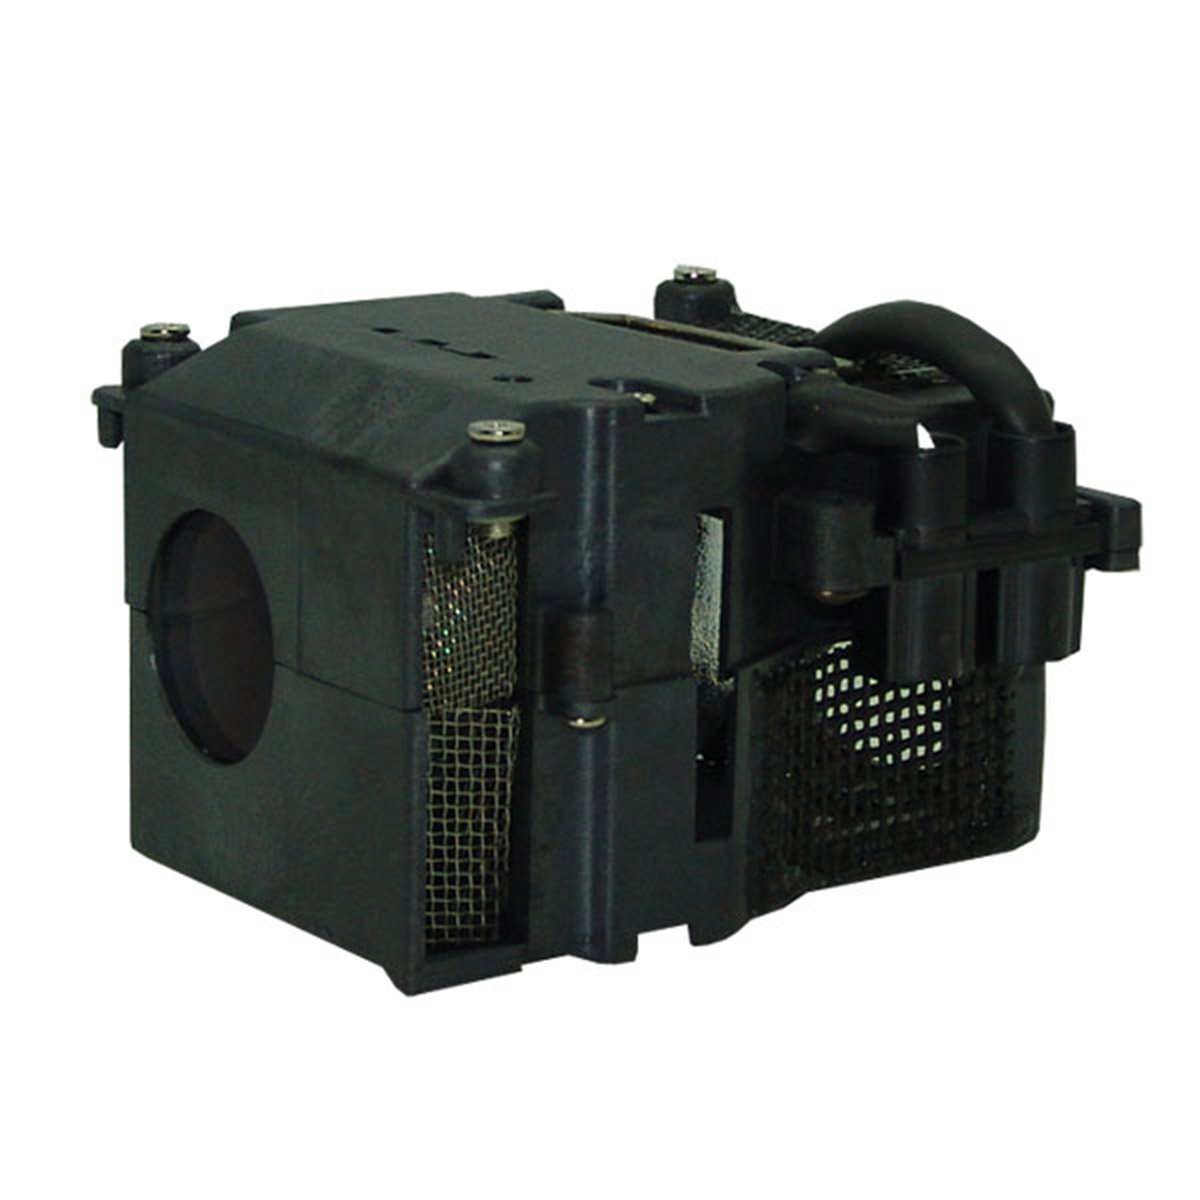 SpArc OEMプロジェクター交換用ランプ 囲い/電球付き Platinum (Brighter/Durable) Platinum (Brighter/Durable) Lamp with Housing B07MPRRV3F